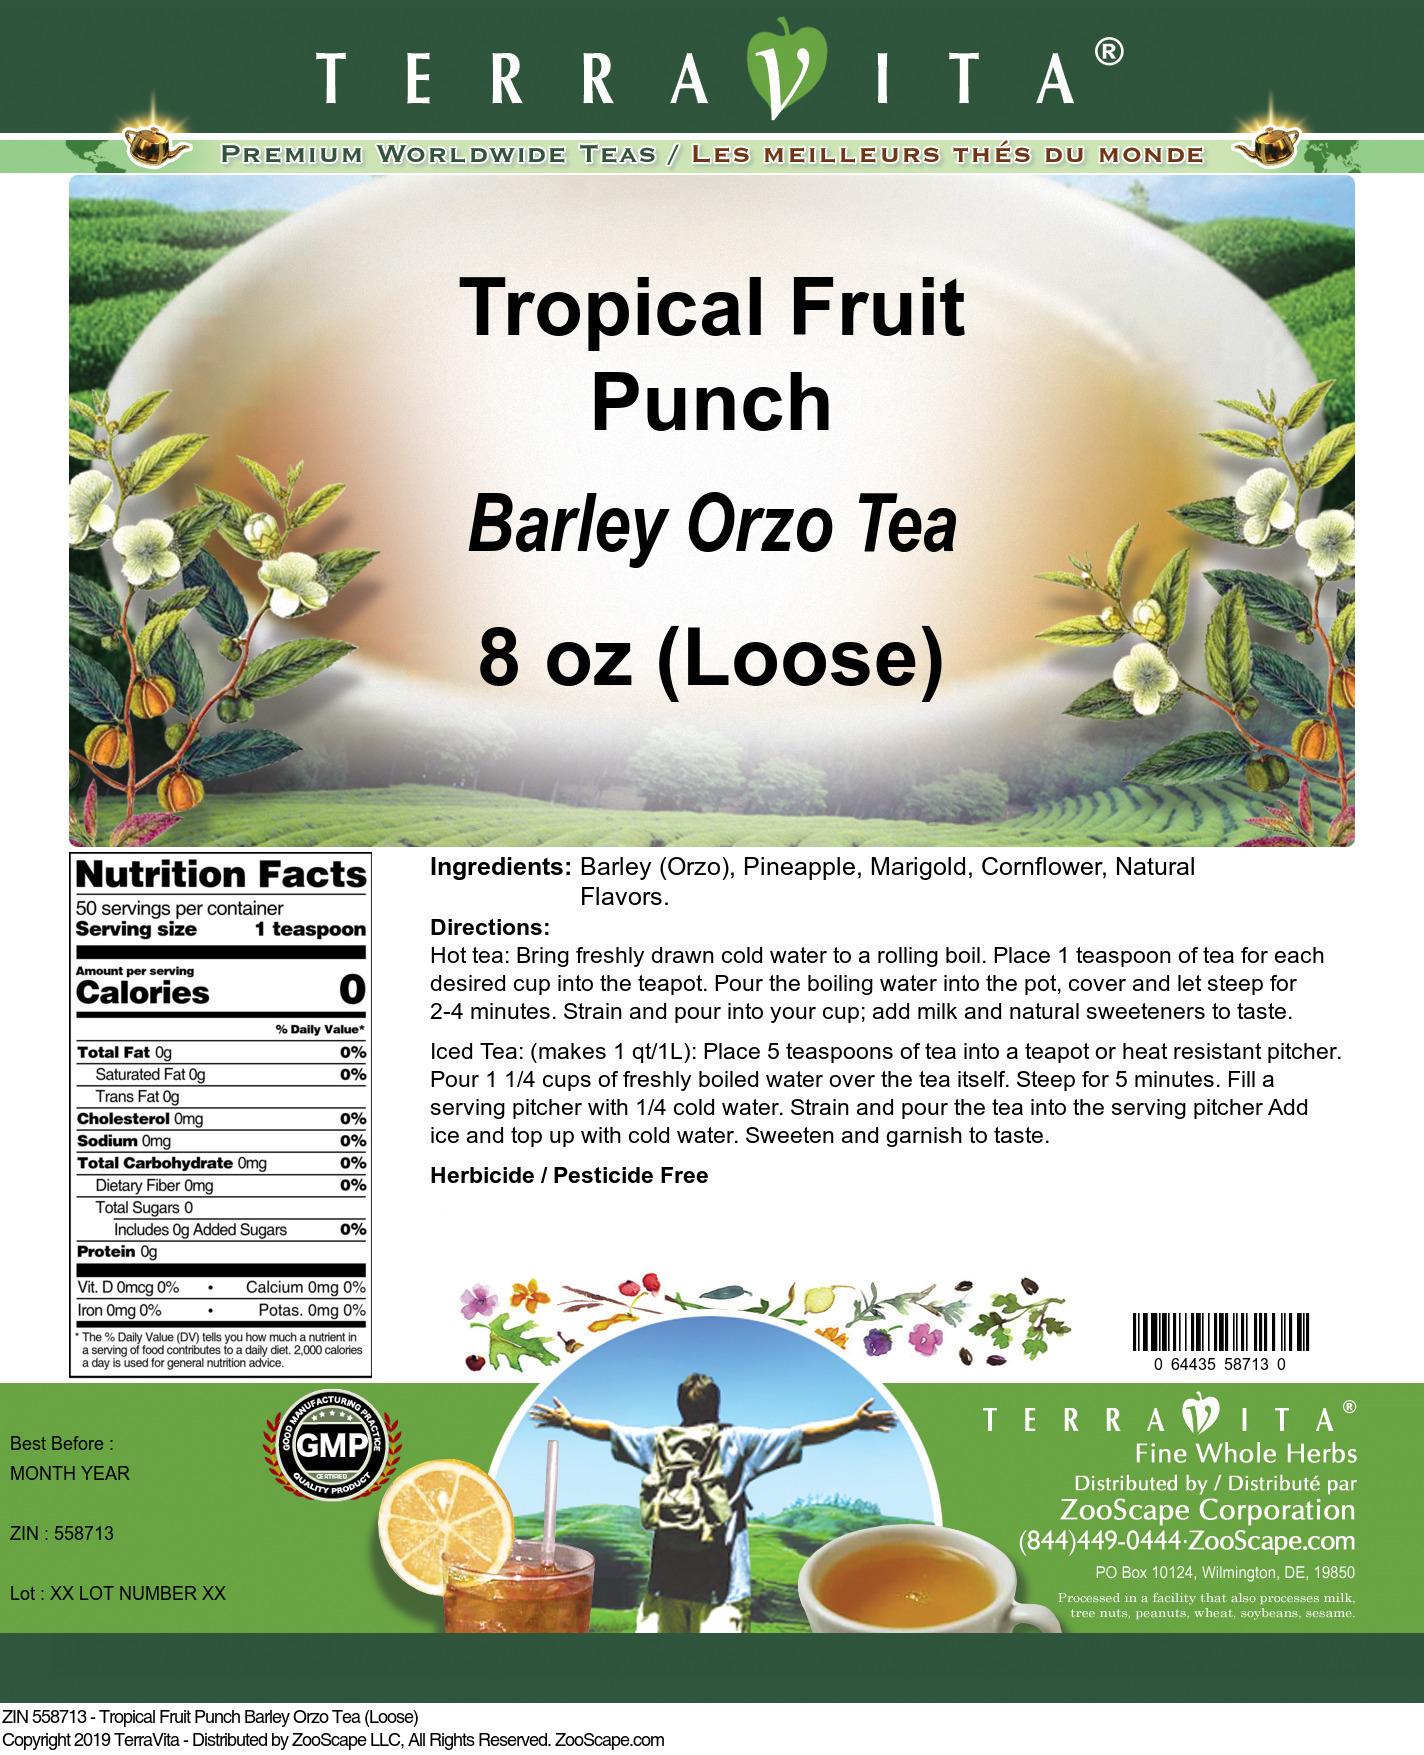 Tropical Fruit Punch Barley Orzo Tea (Loose)